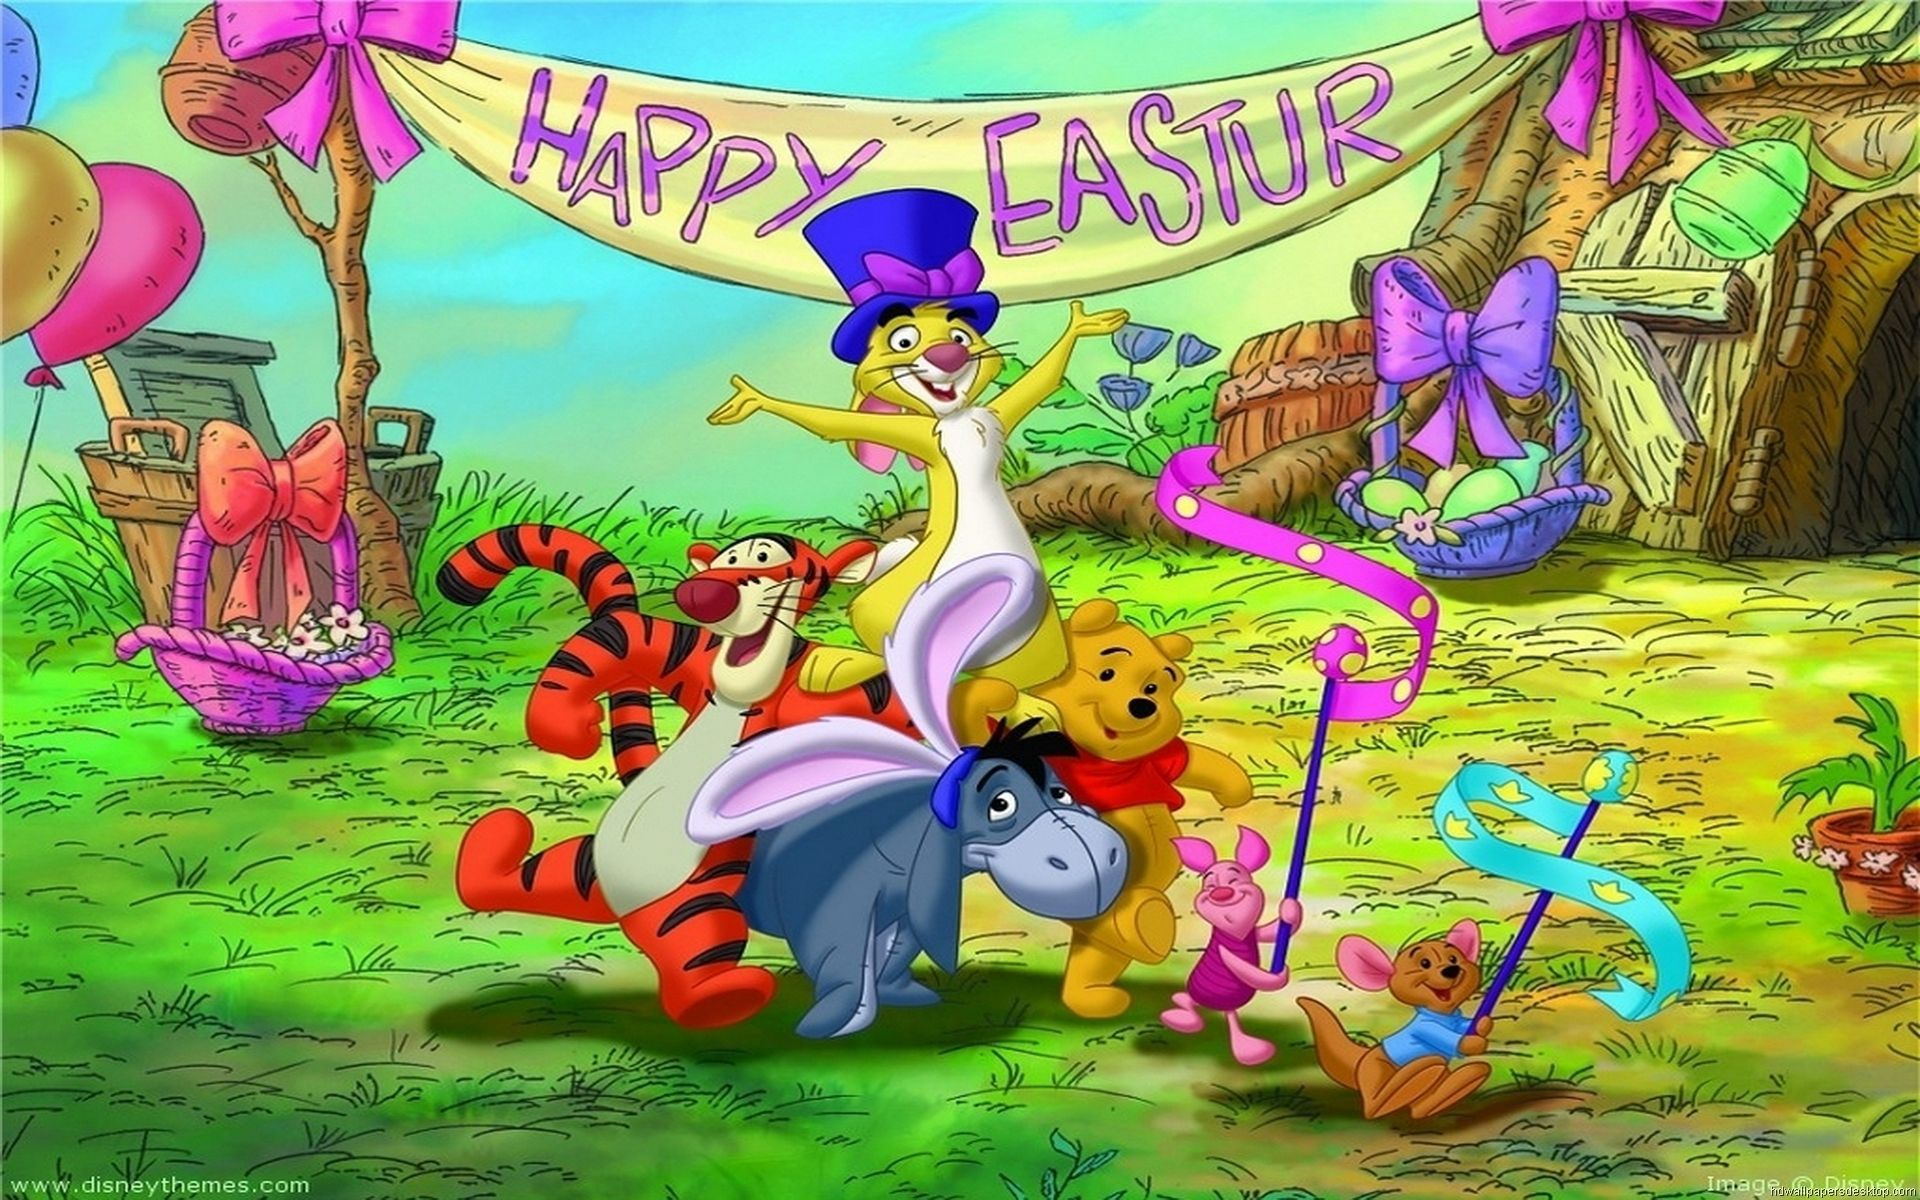 Disney Easter Desktop Wallpapers Top Free Disney Easter Desktop